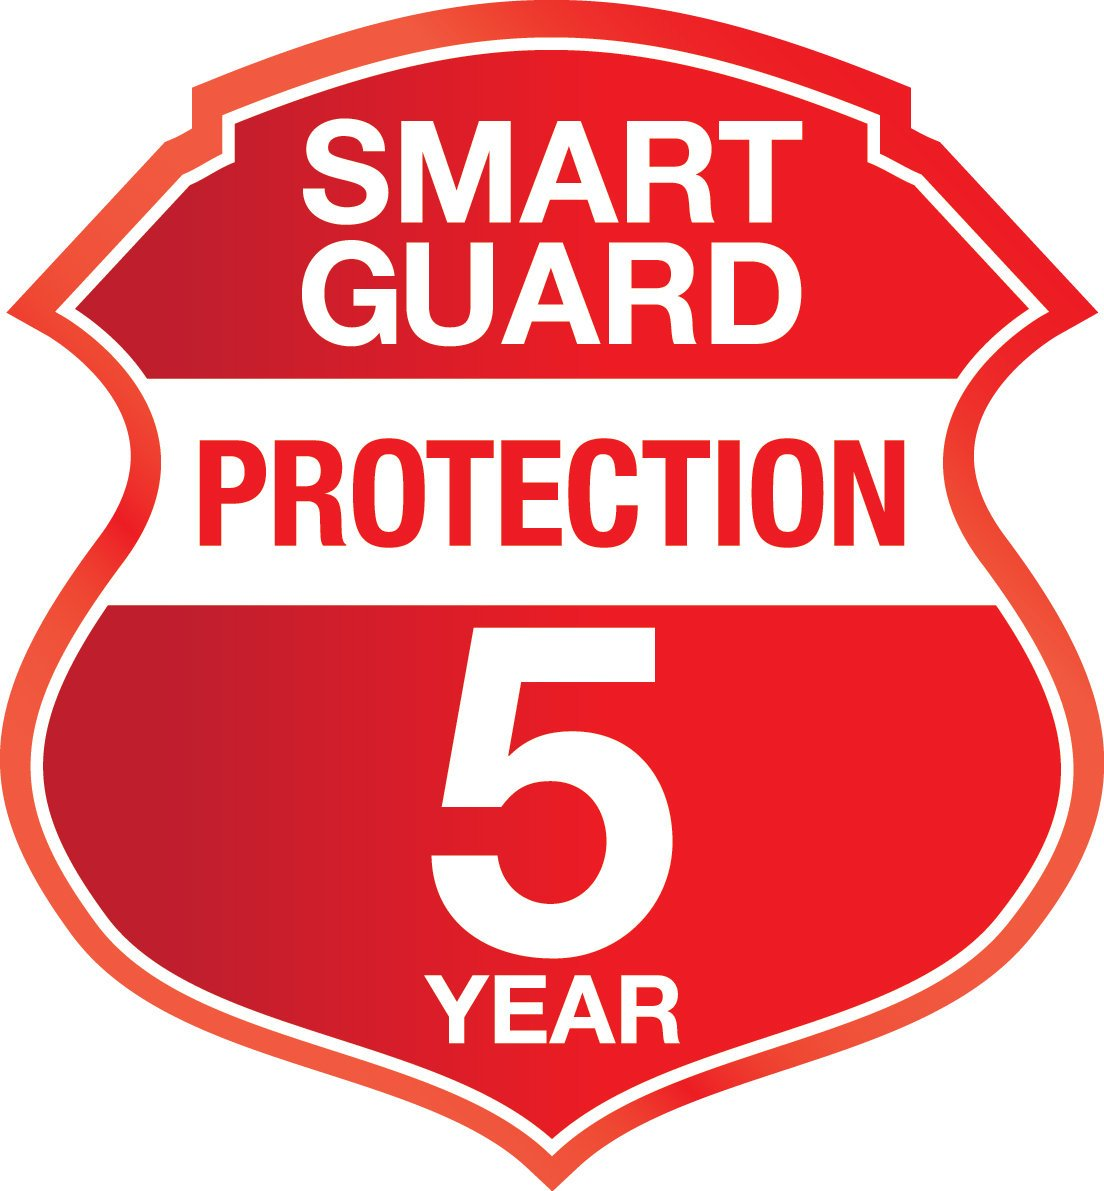 SmartGuard 5-Year Major Appliance Protection Plan ($450-$500)